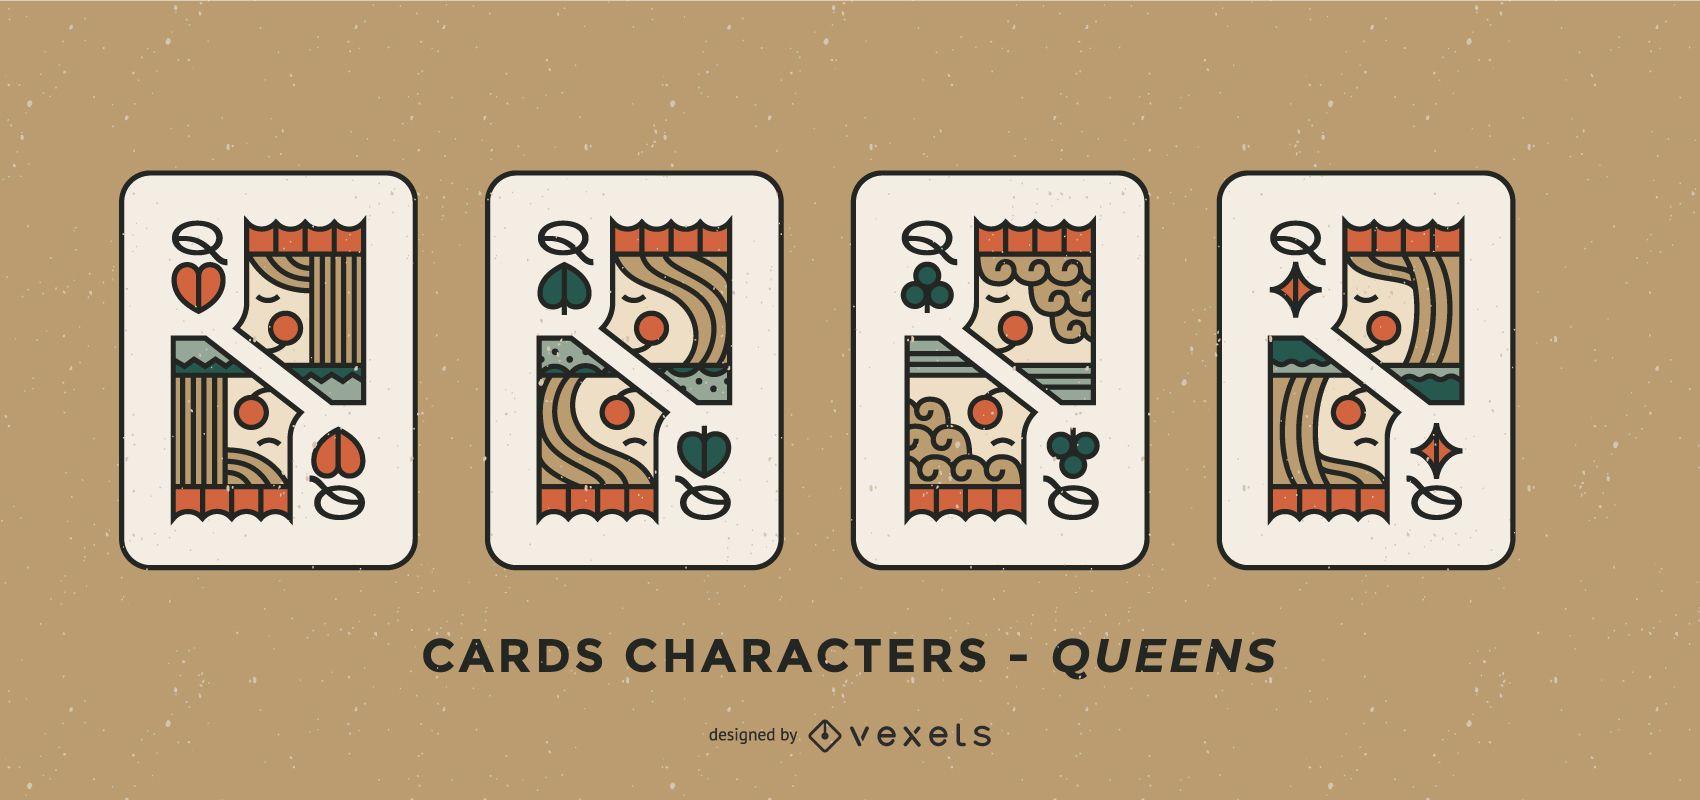 Poker Card Queen Character Design Set